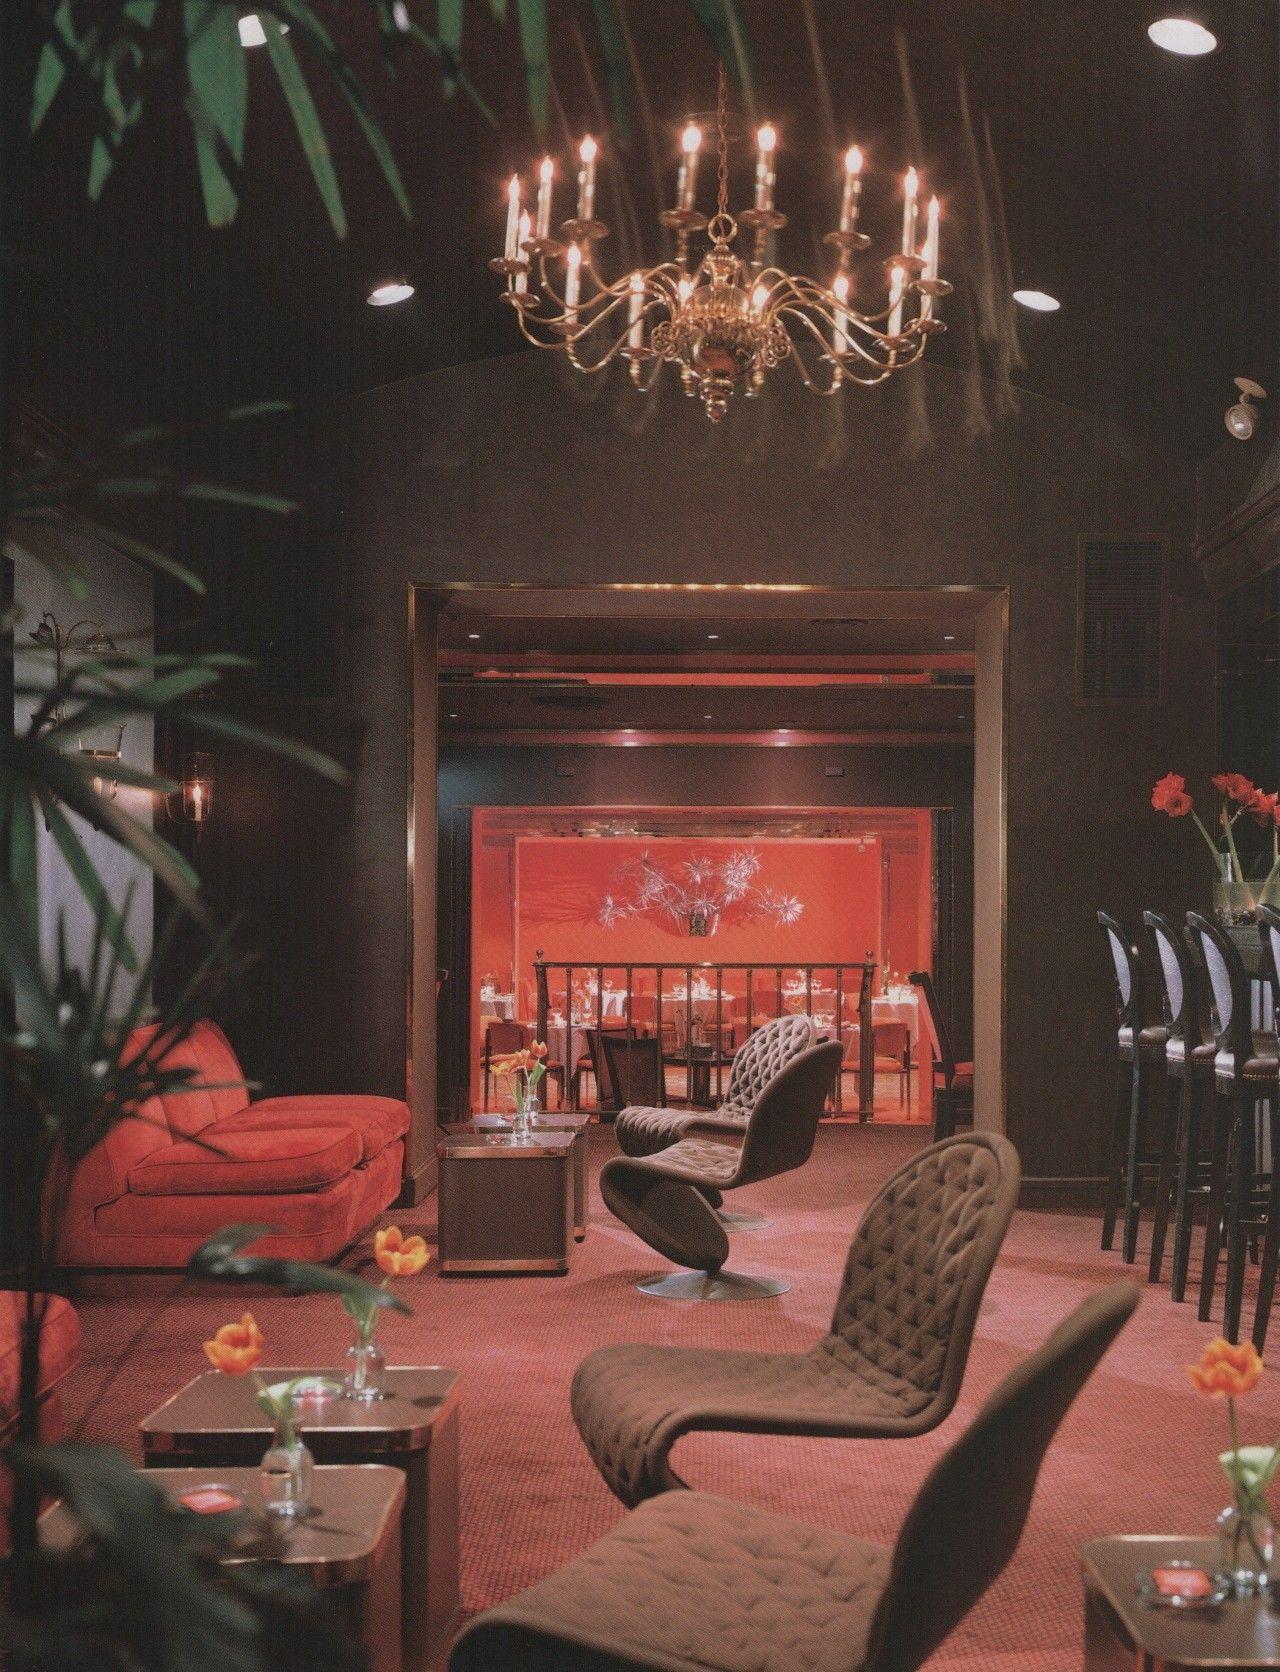 Perpetual Light Vintage Etsy Vintage Interior Design Retro Interior Design Interior